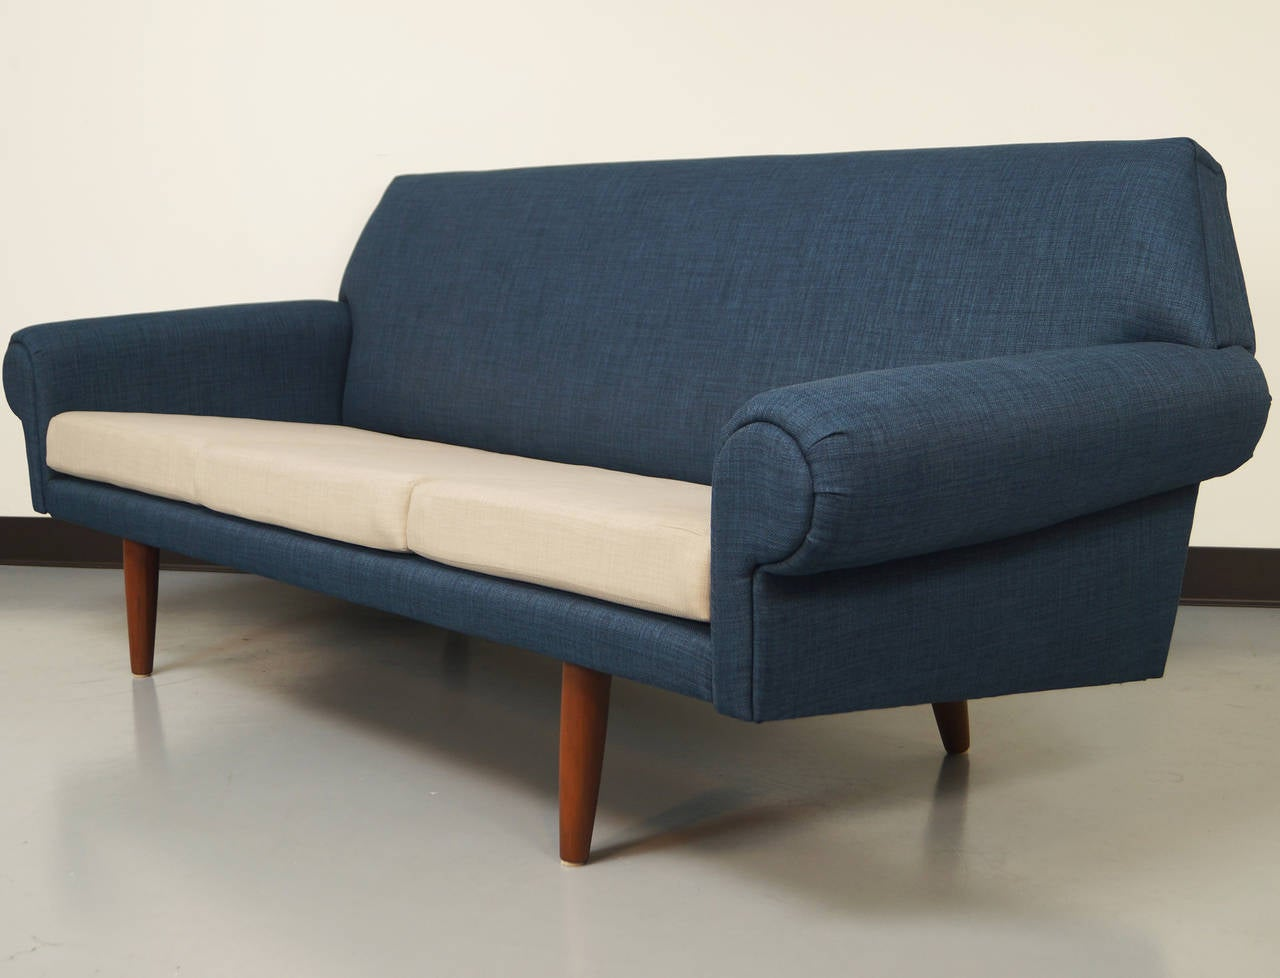 Danish Modern Sofa by Hans Wegner at 1stdibs